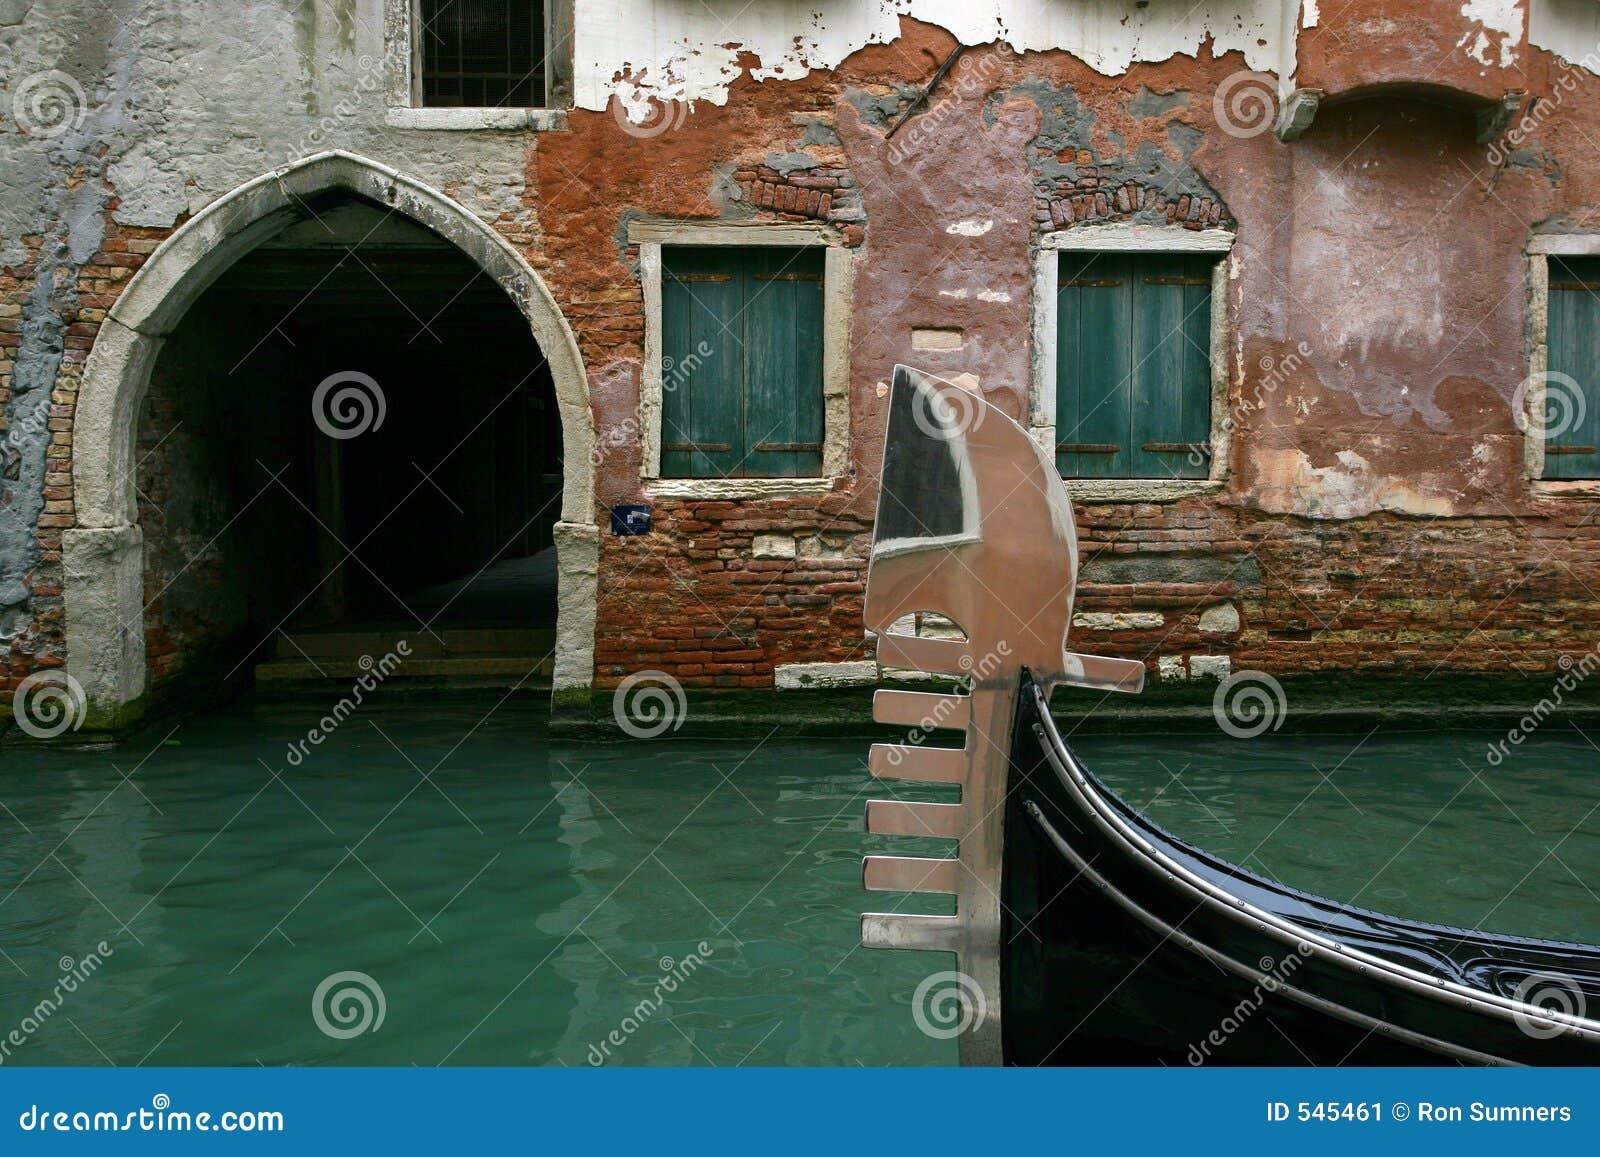 Download 长平底船等待 库存图片. 图片 包括有 意大利语, 欧洲, 假期, 小船, 观光, 旅游业, 意大利, 平安 - 545461